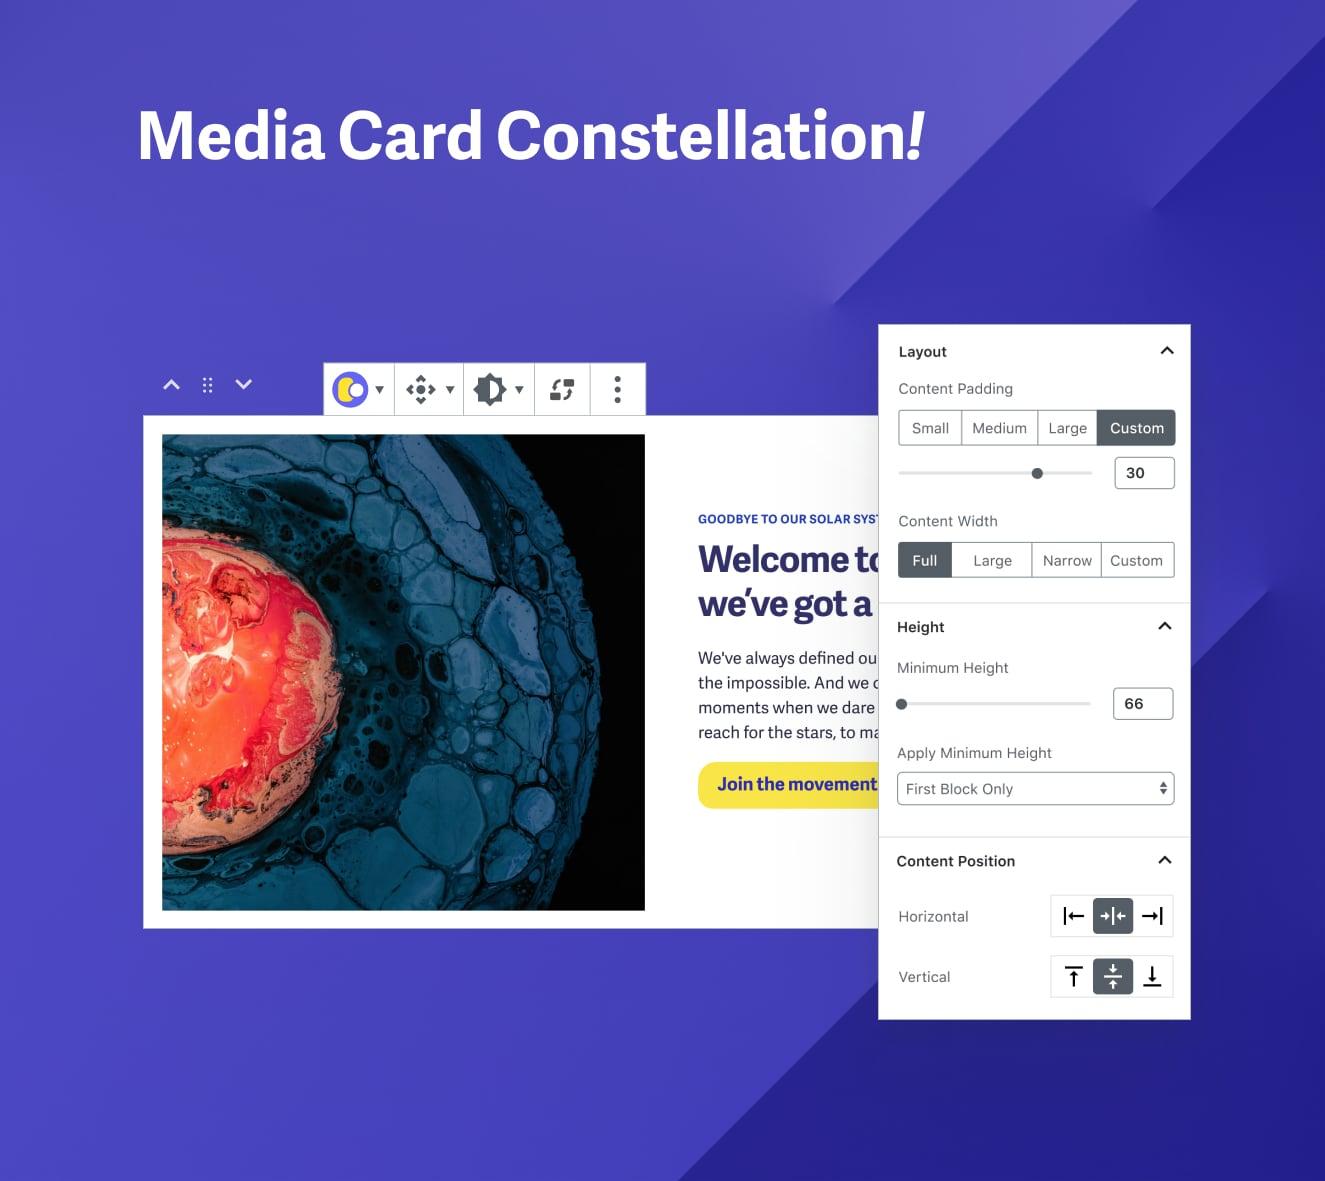 Media Card Constellation block options